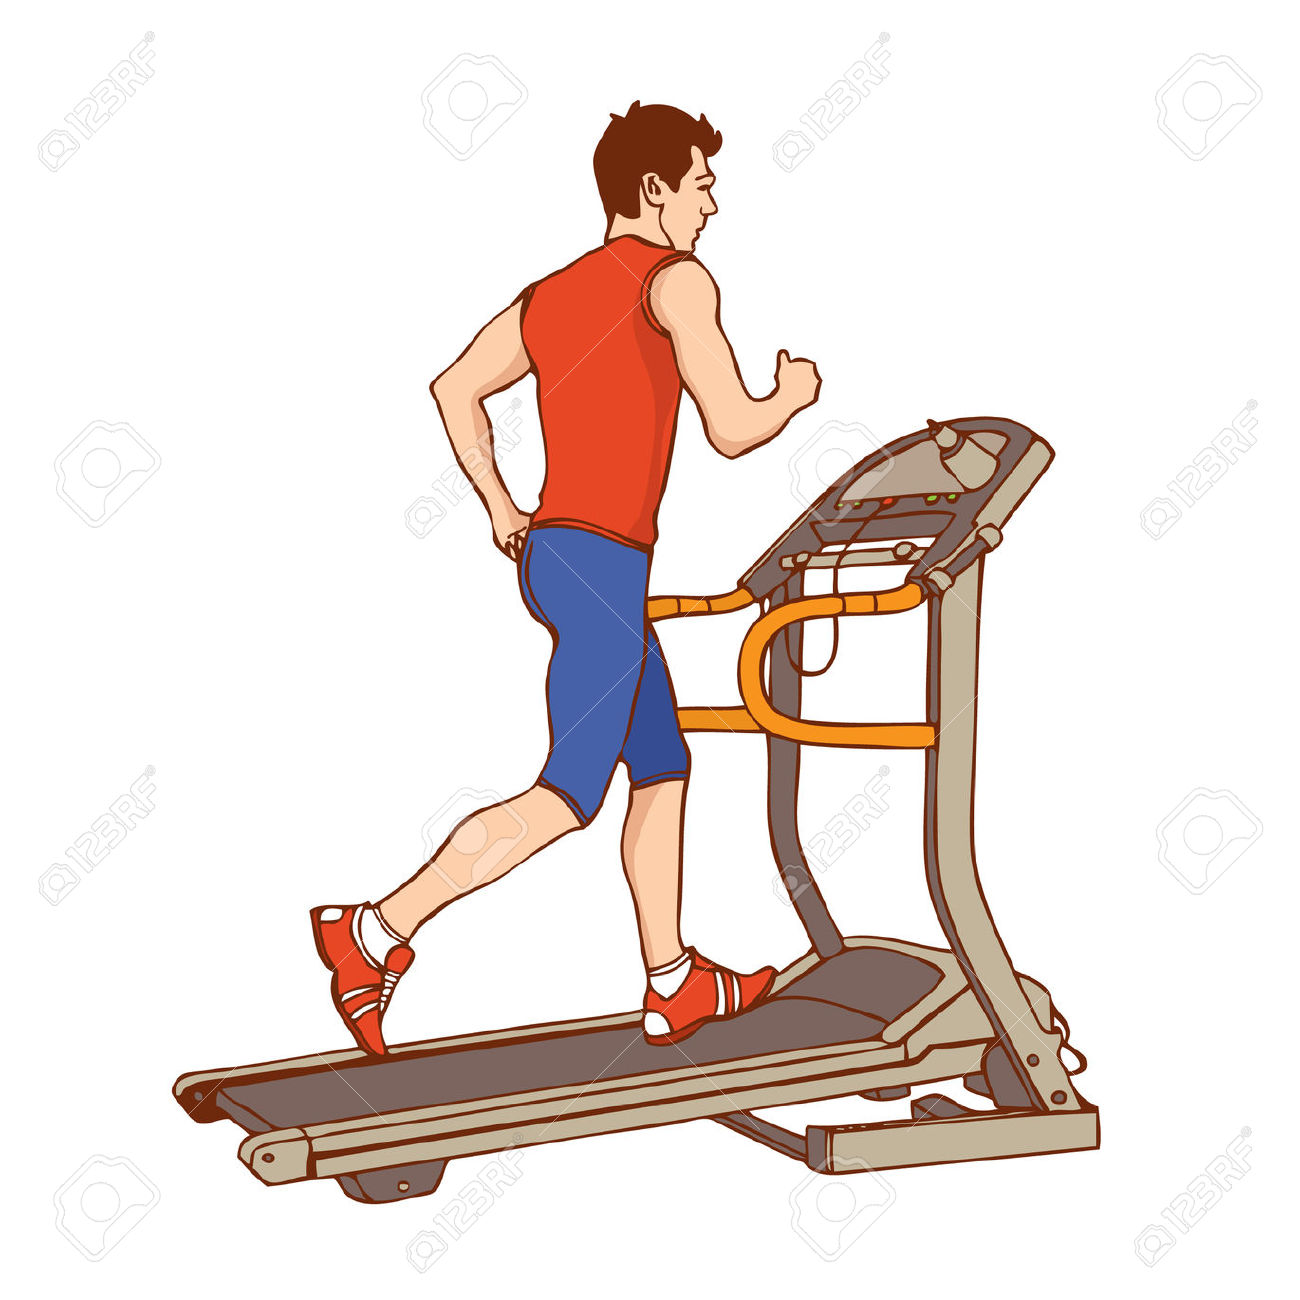 Free Exercising Treadmill Cliparts, Download Free Clip Art.